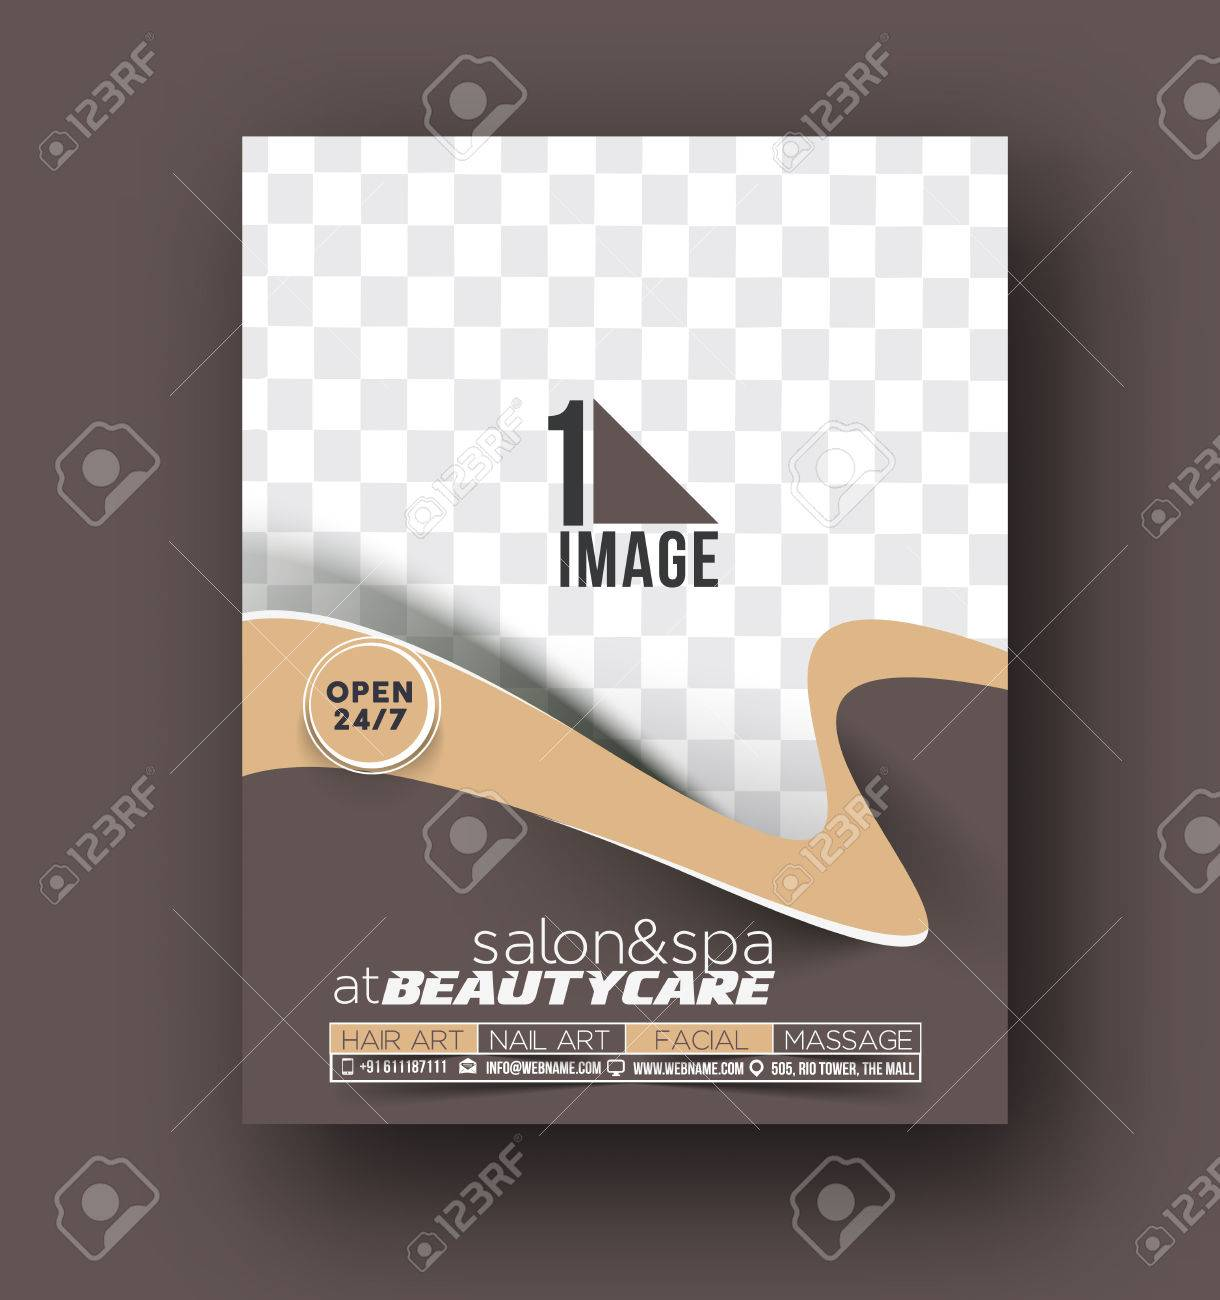 Exelent Hair Salon Flyer Schablone Vignette - FORTSETZUNG ...